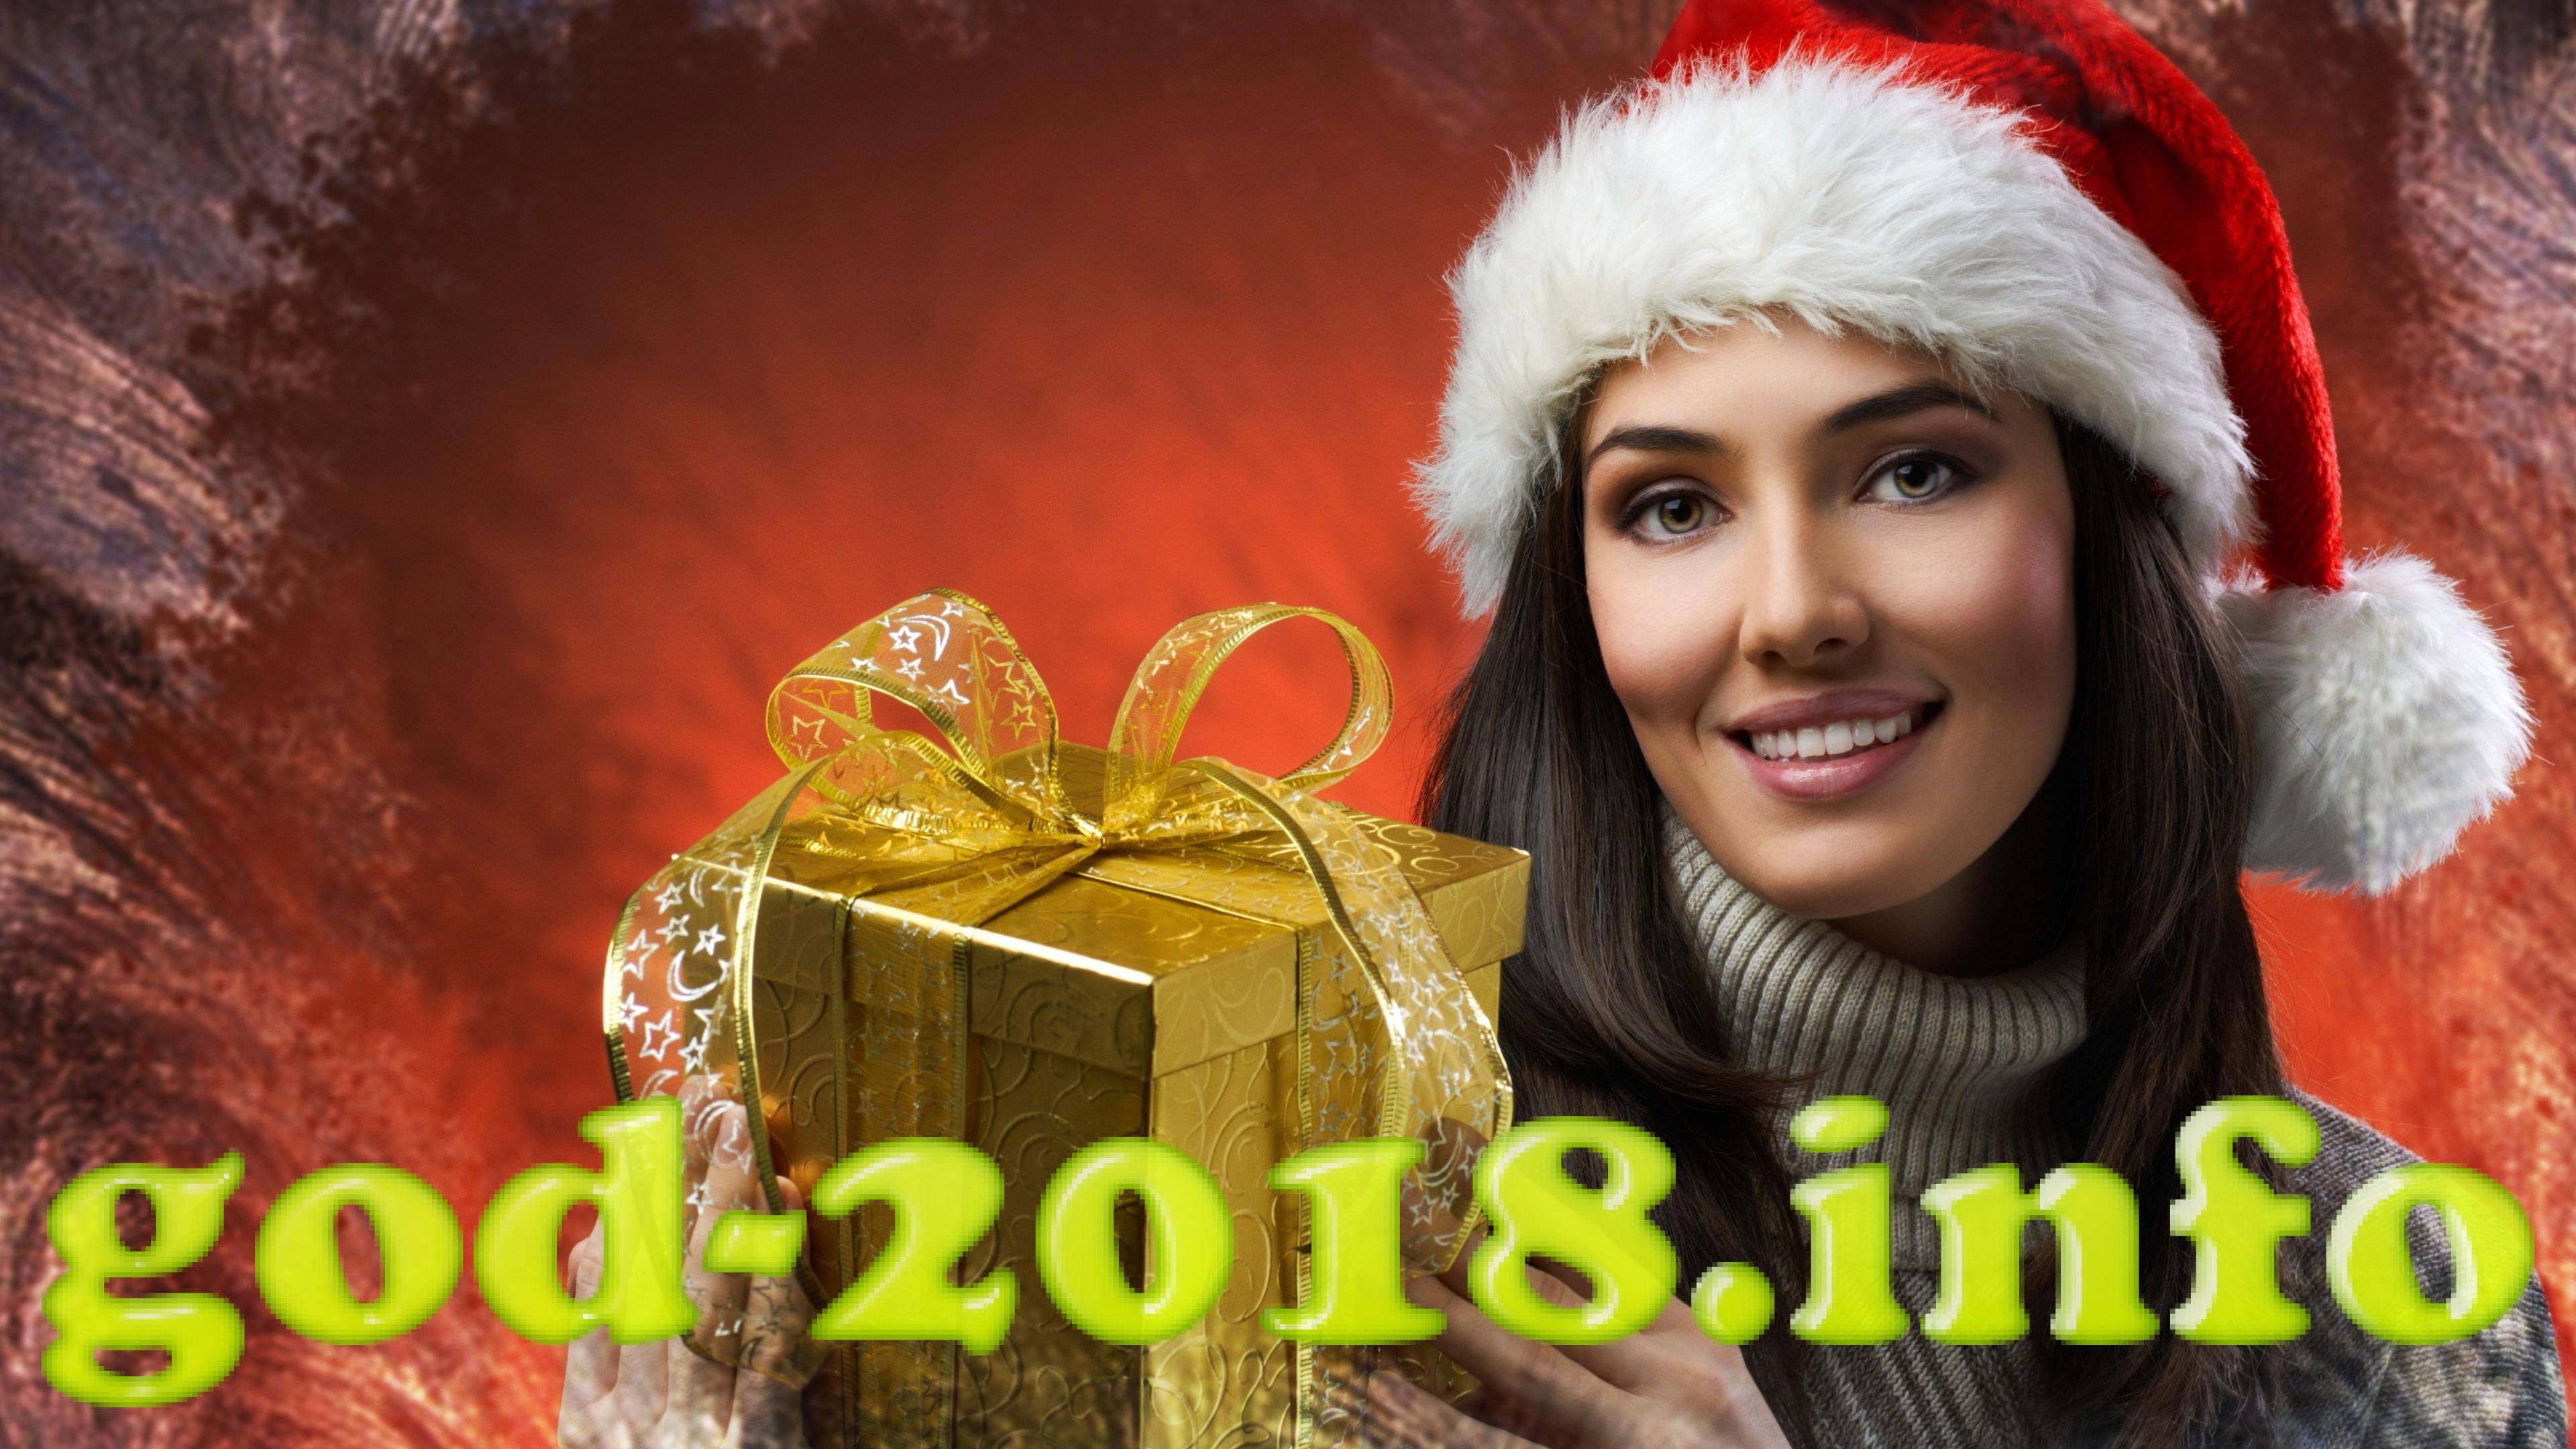 interesnye-pozdravlenija-s-novym-godom-2018-dlja-ljubimoj-5